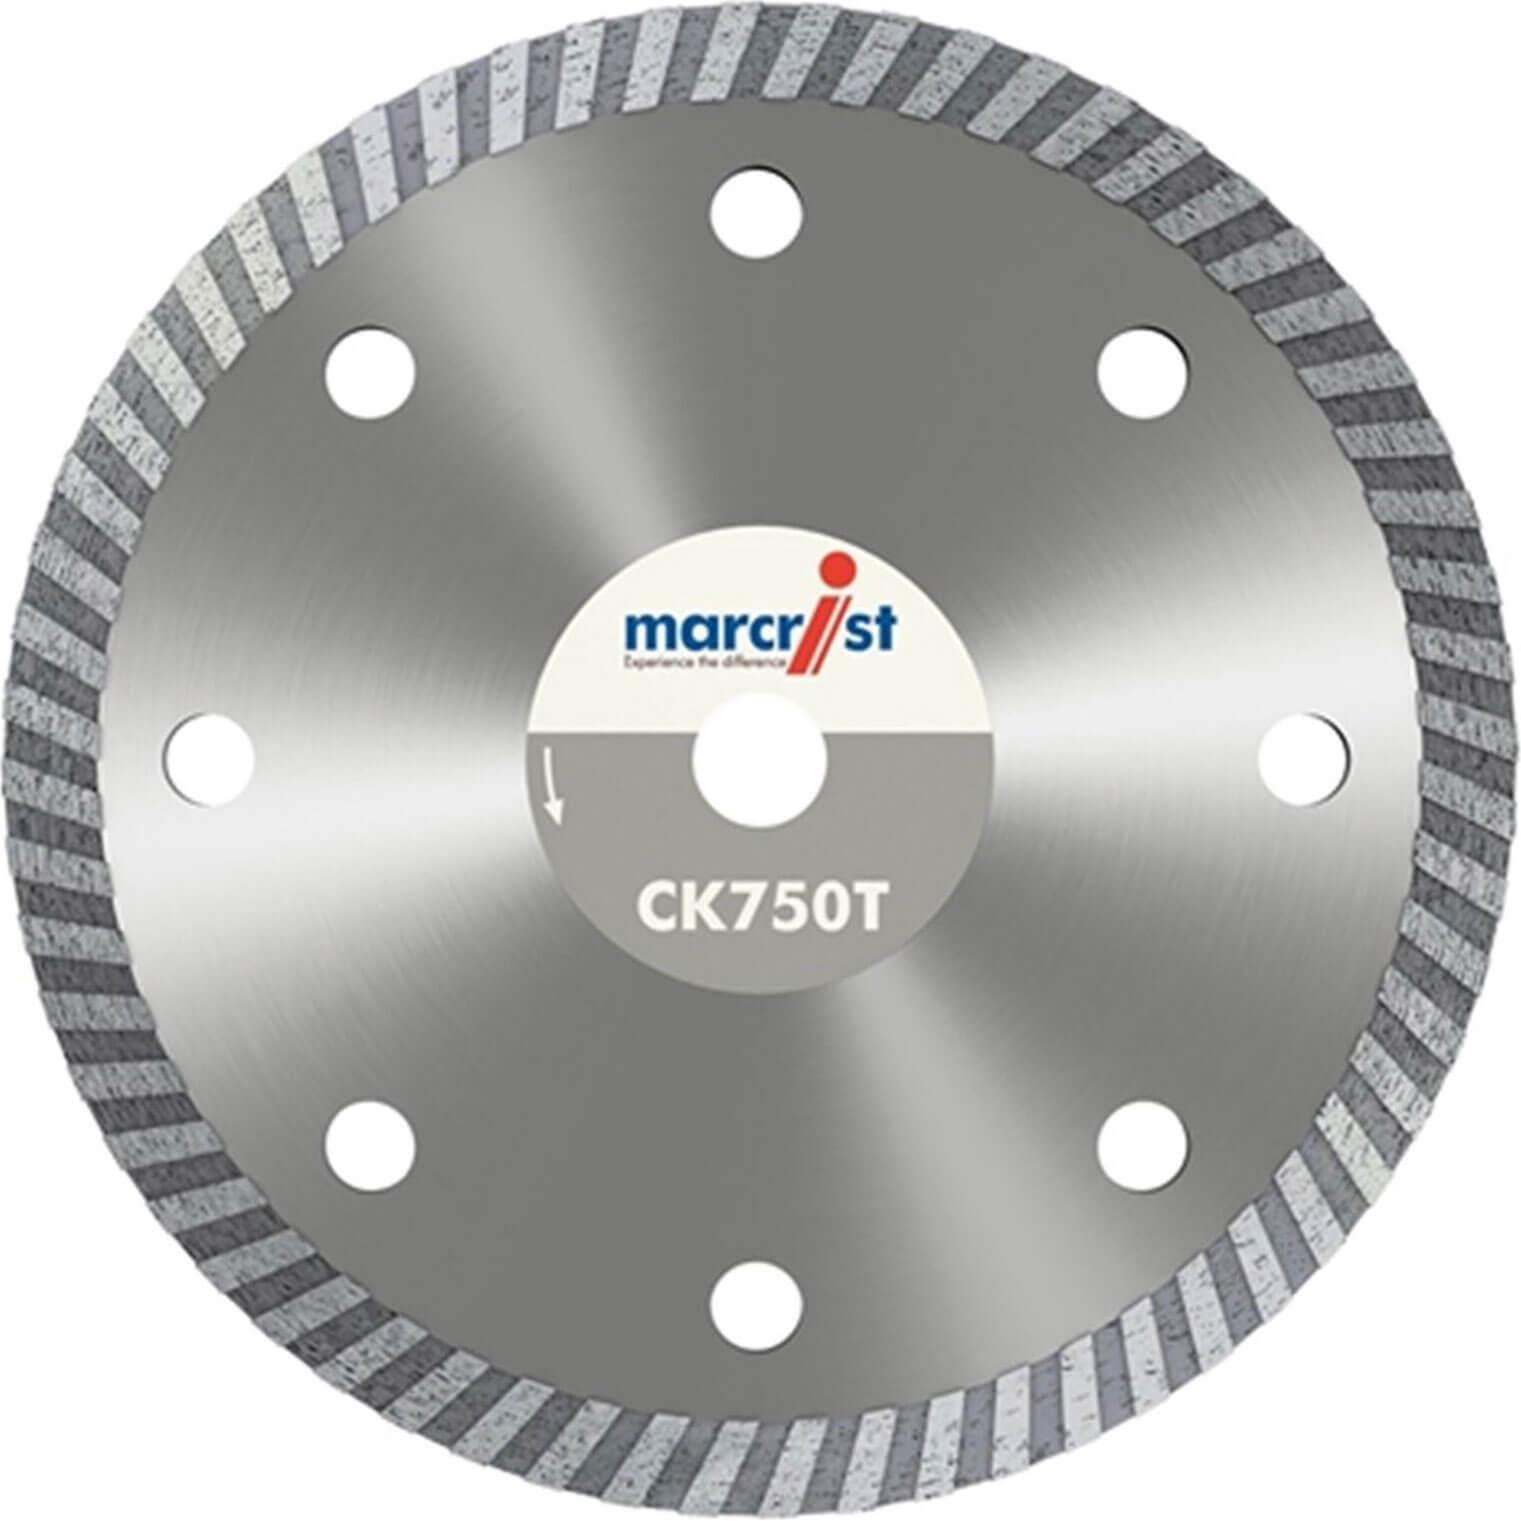 Image of Marcrist CK750T Ultra Thin Turbo Tile Diamond Cutting Disc 115mm